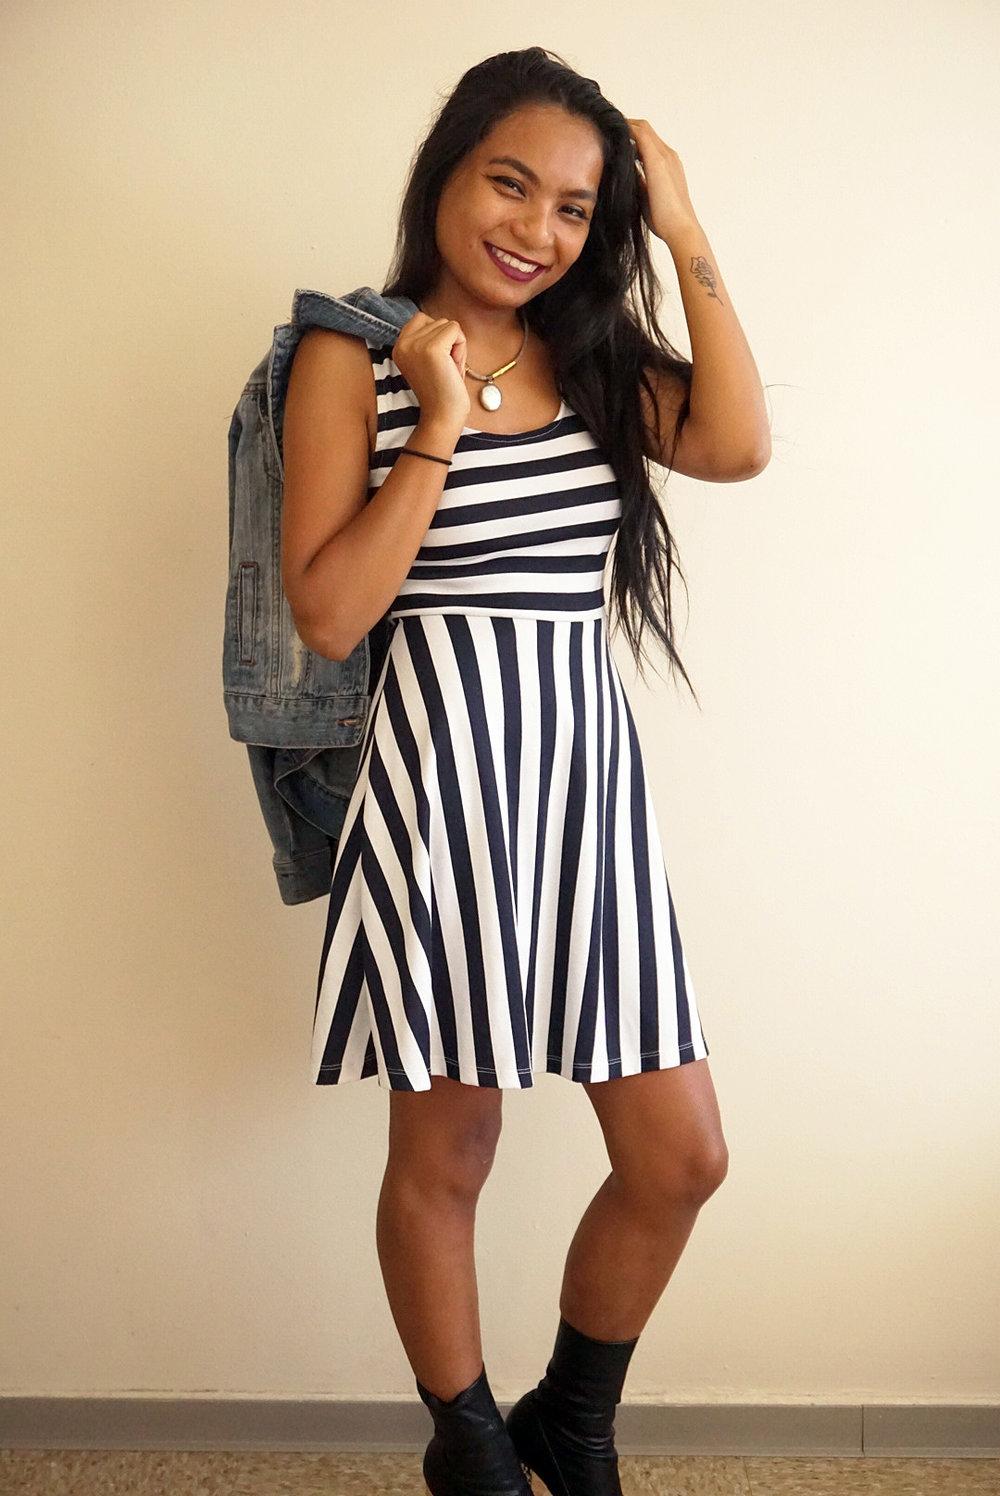 Striped-Dress-Black-Amiclubwear-Boots-Fall-Style-Blogger-LINDATENCHITRAN-5-1616x1080.jpg